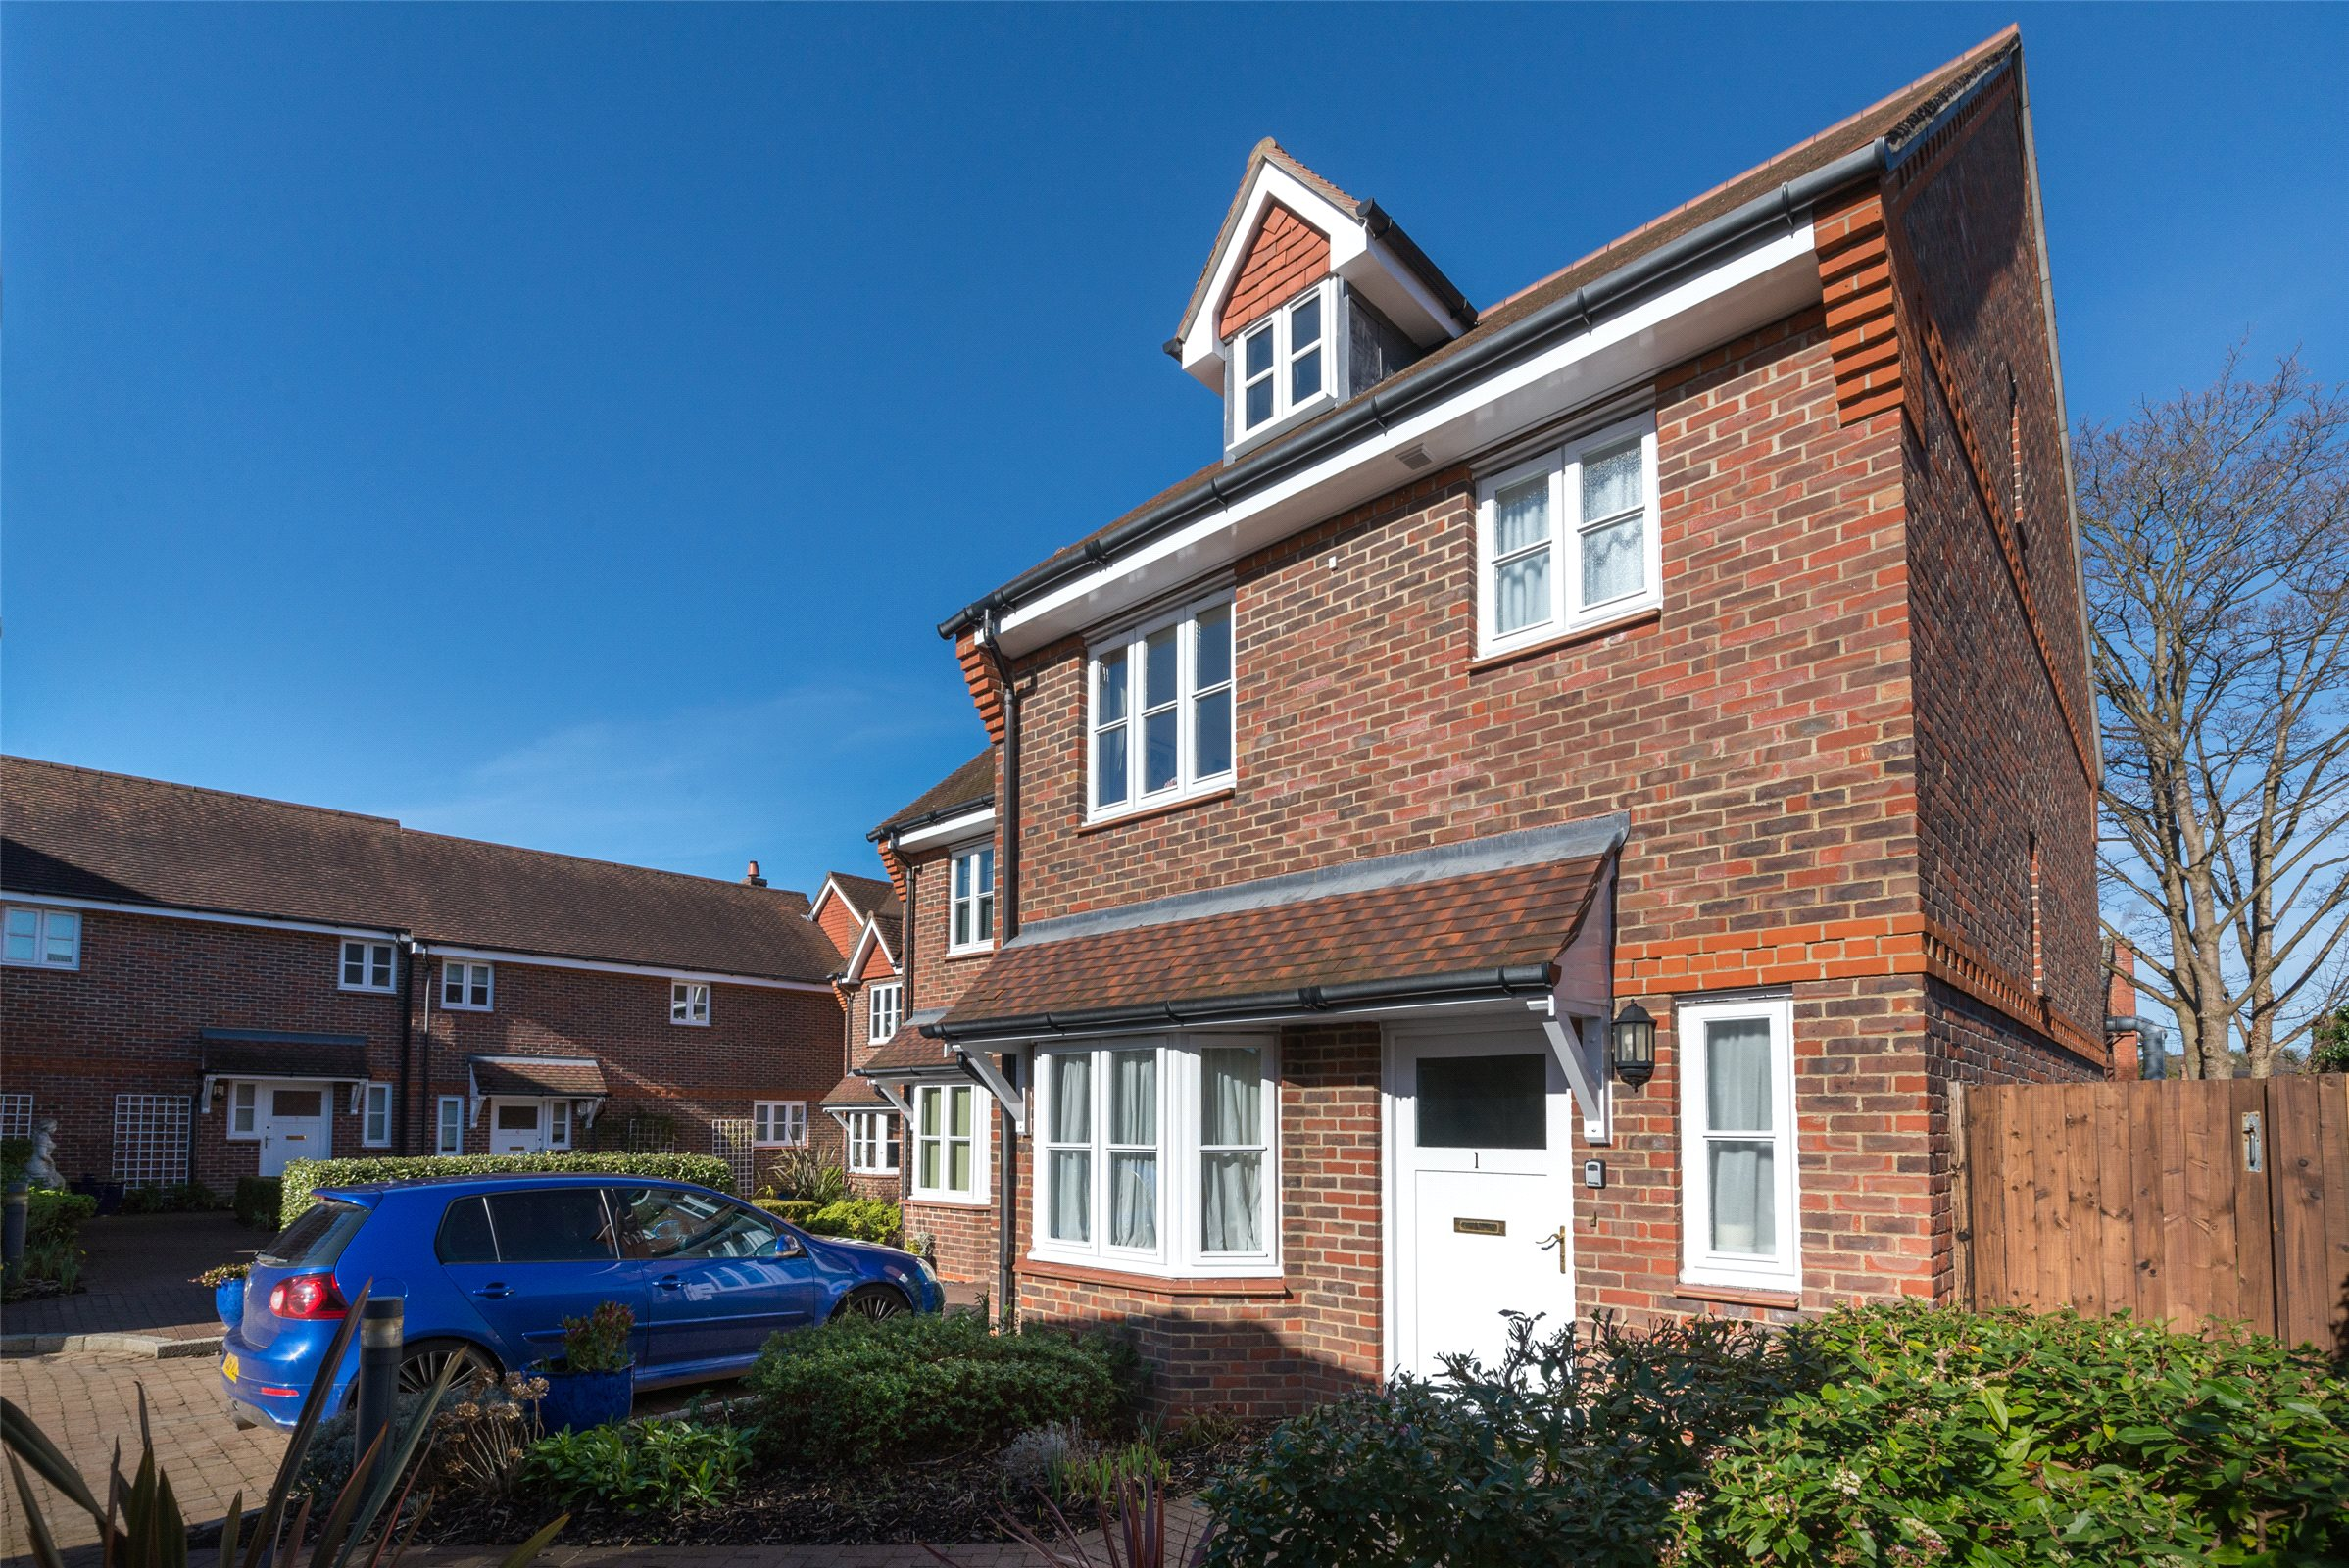 3 Bedrooms Semi Detached House for sale in Westfield Gardens, Dorking, Surrey, RH4